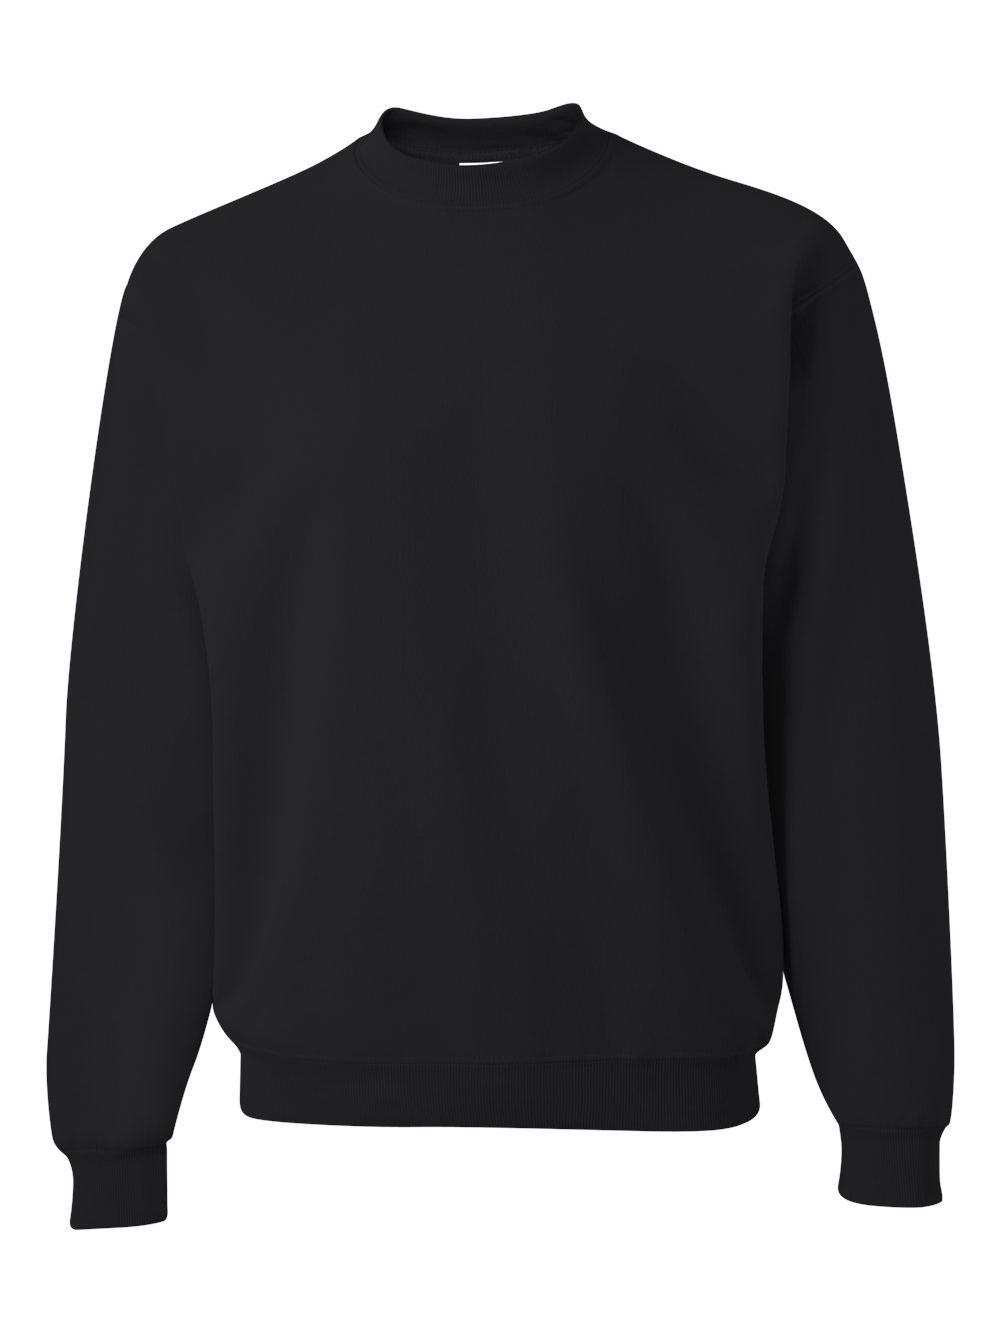 Jerzees-NuBlend-Crewneck-Sweatshirt-562MR thumbnail 9